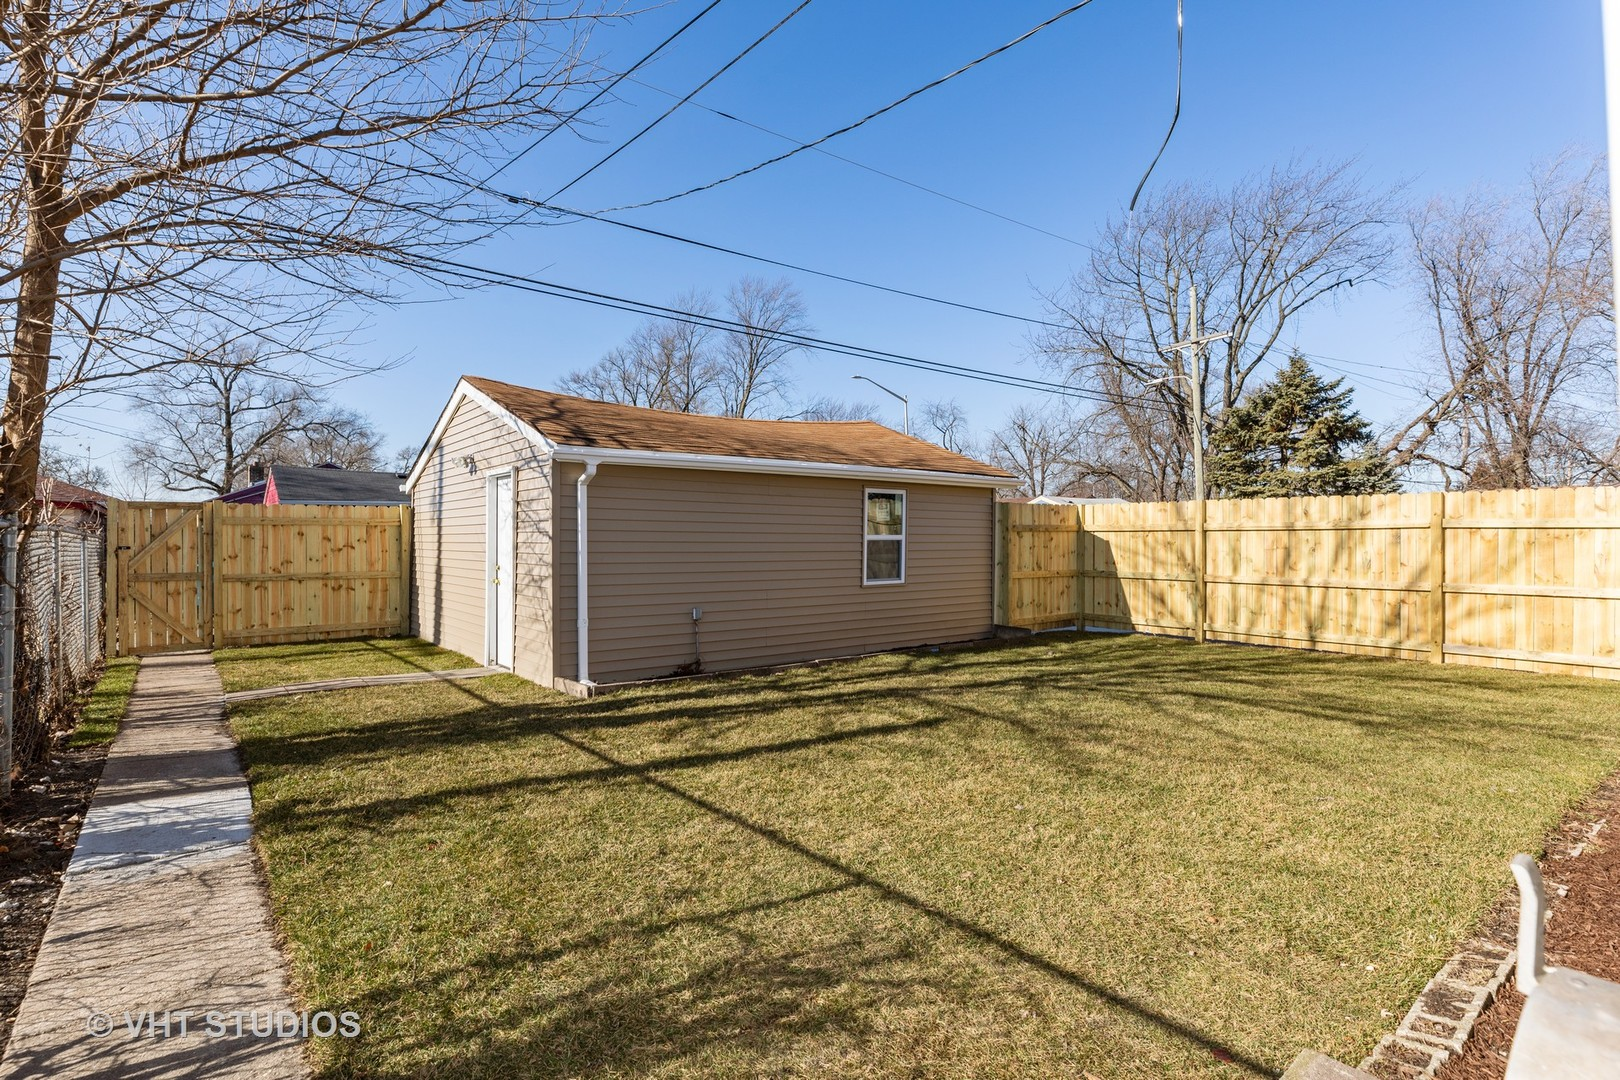 12600 South Ada, Calumet Park, Illinois, 60827